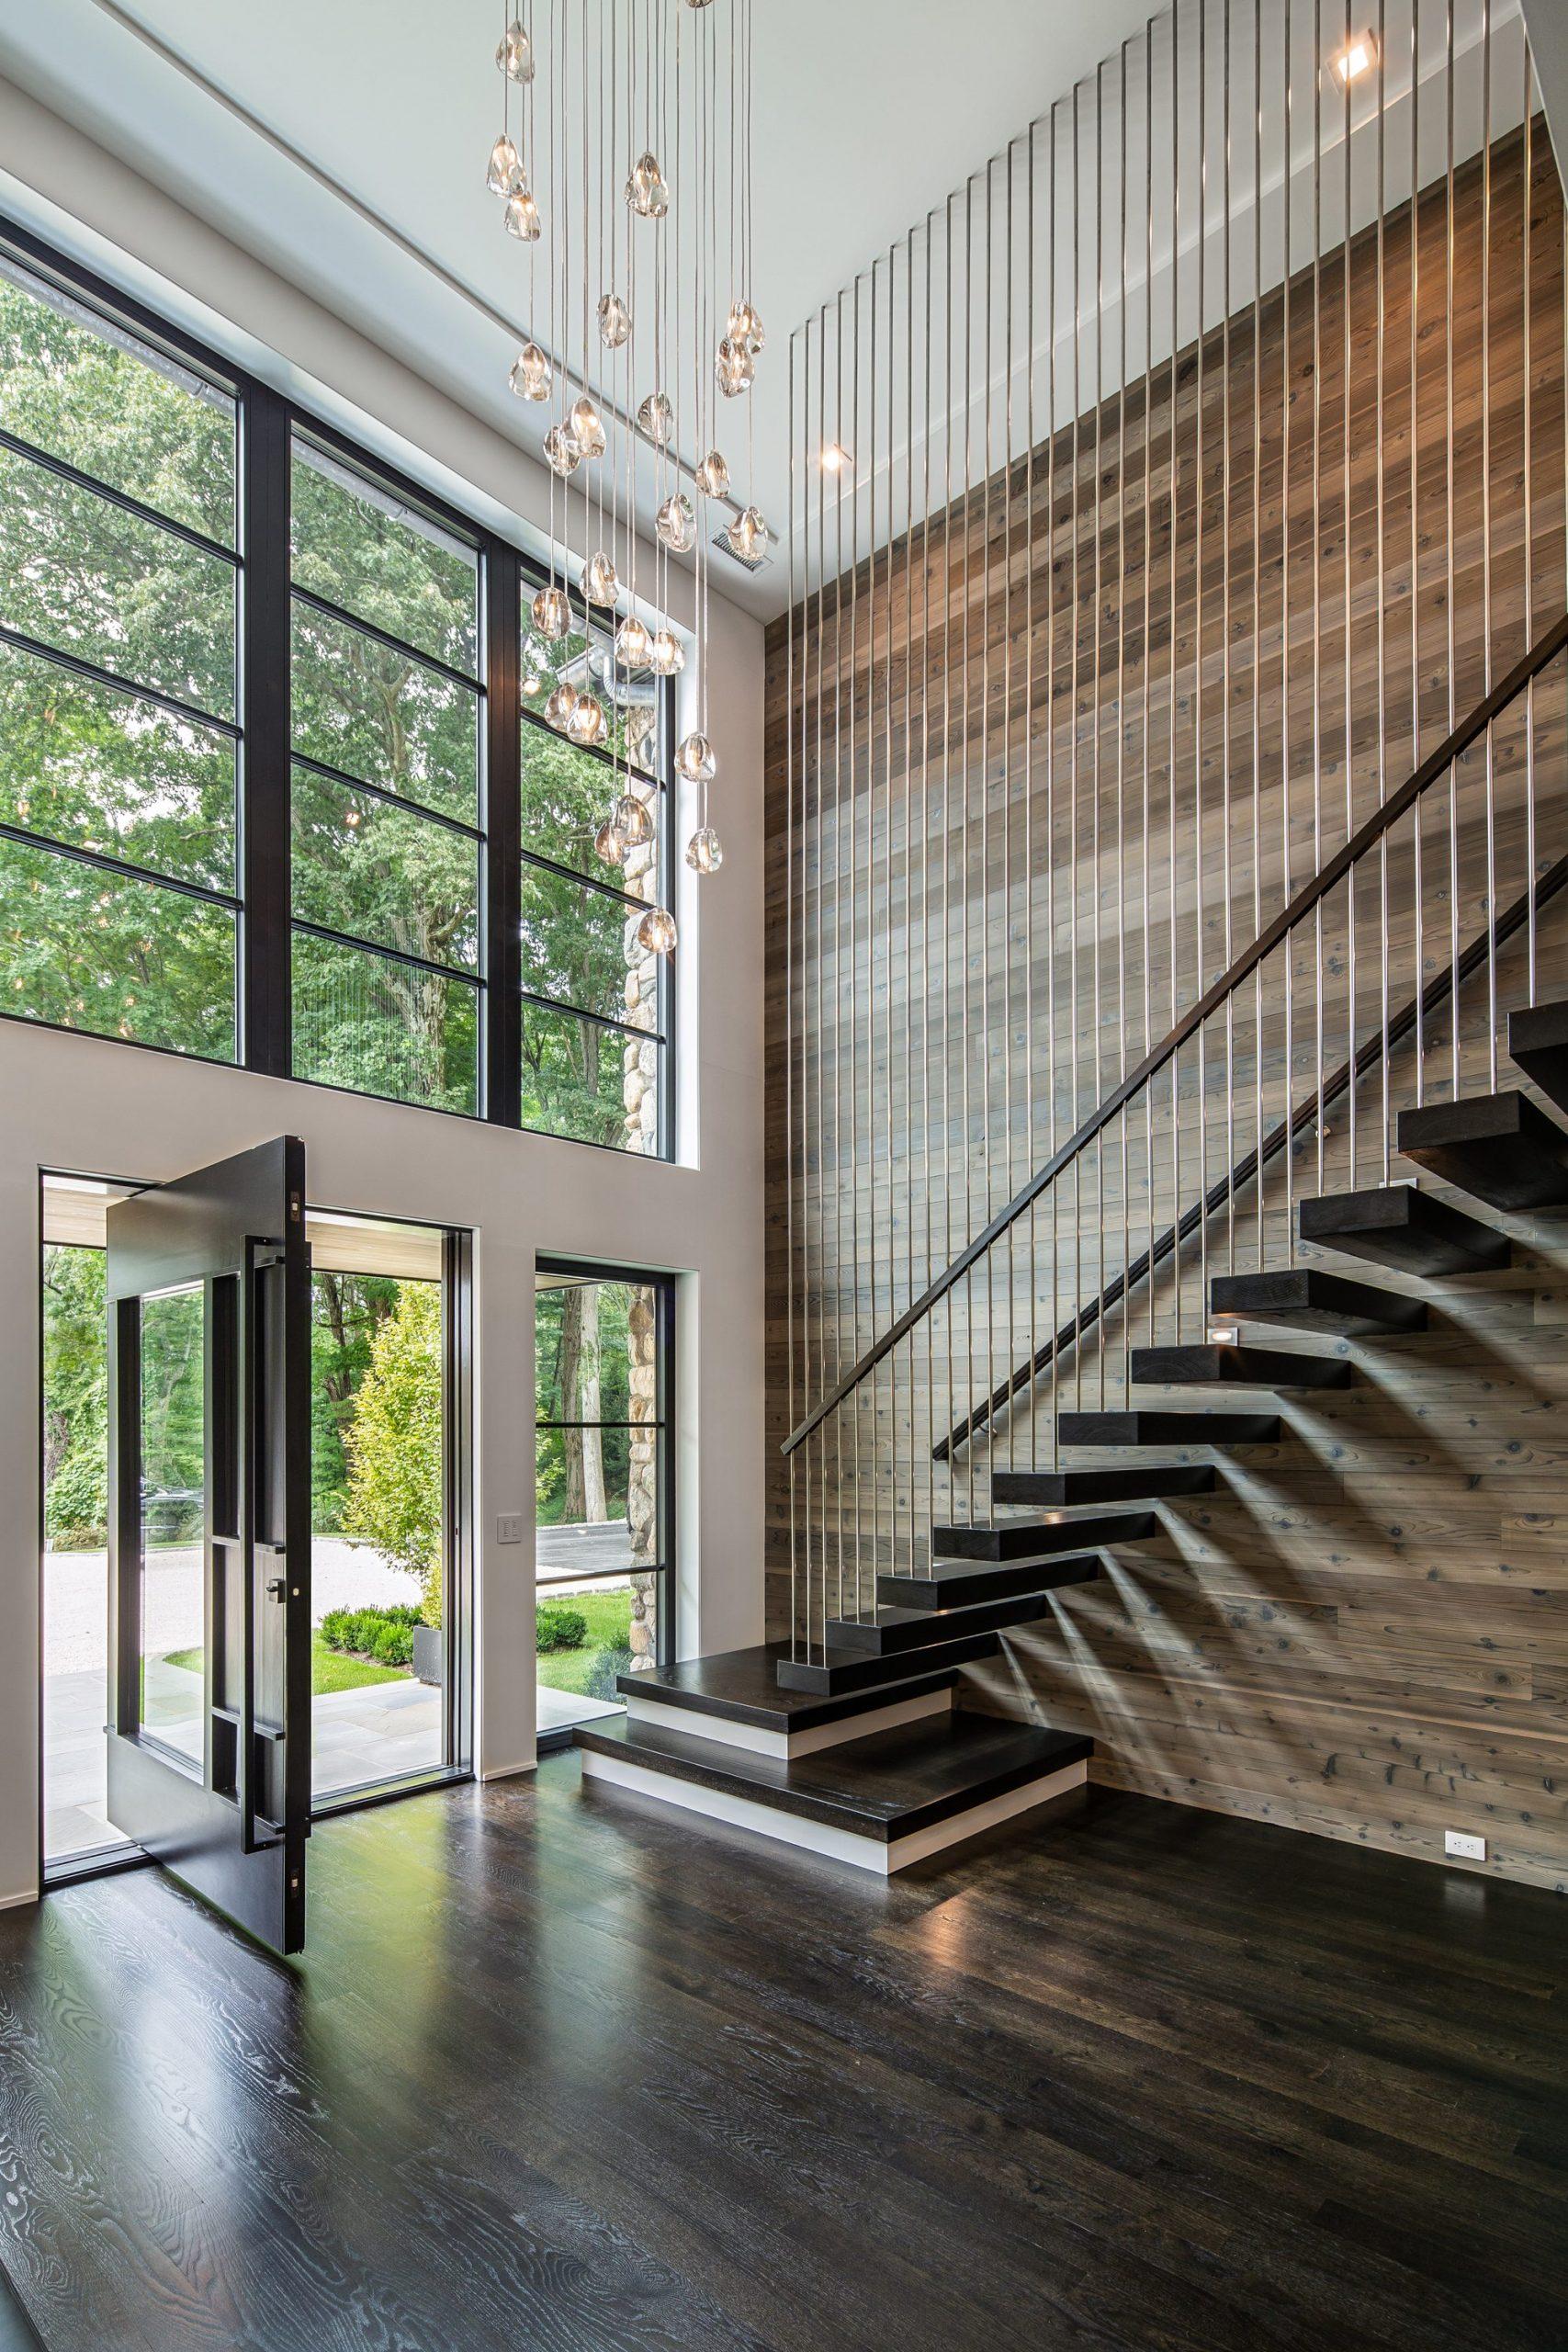 built in stairs interior design ideas walls